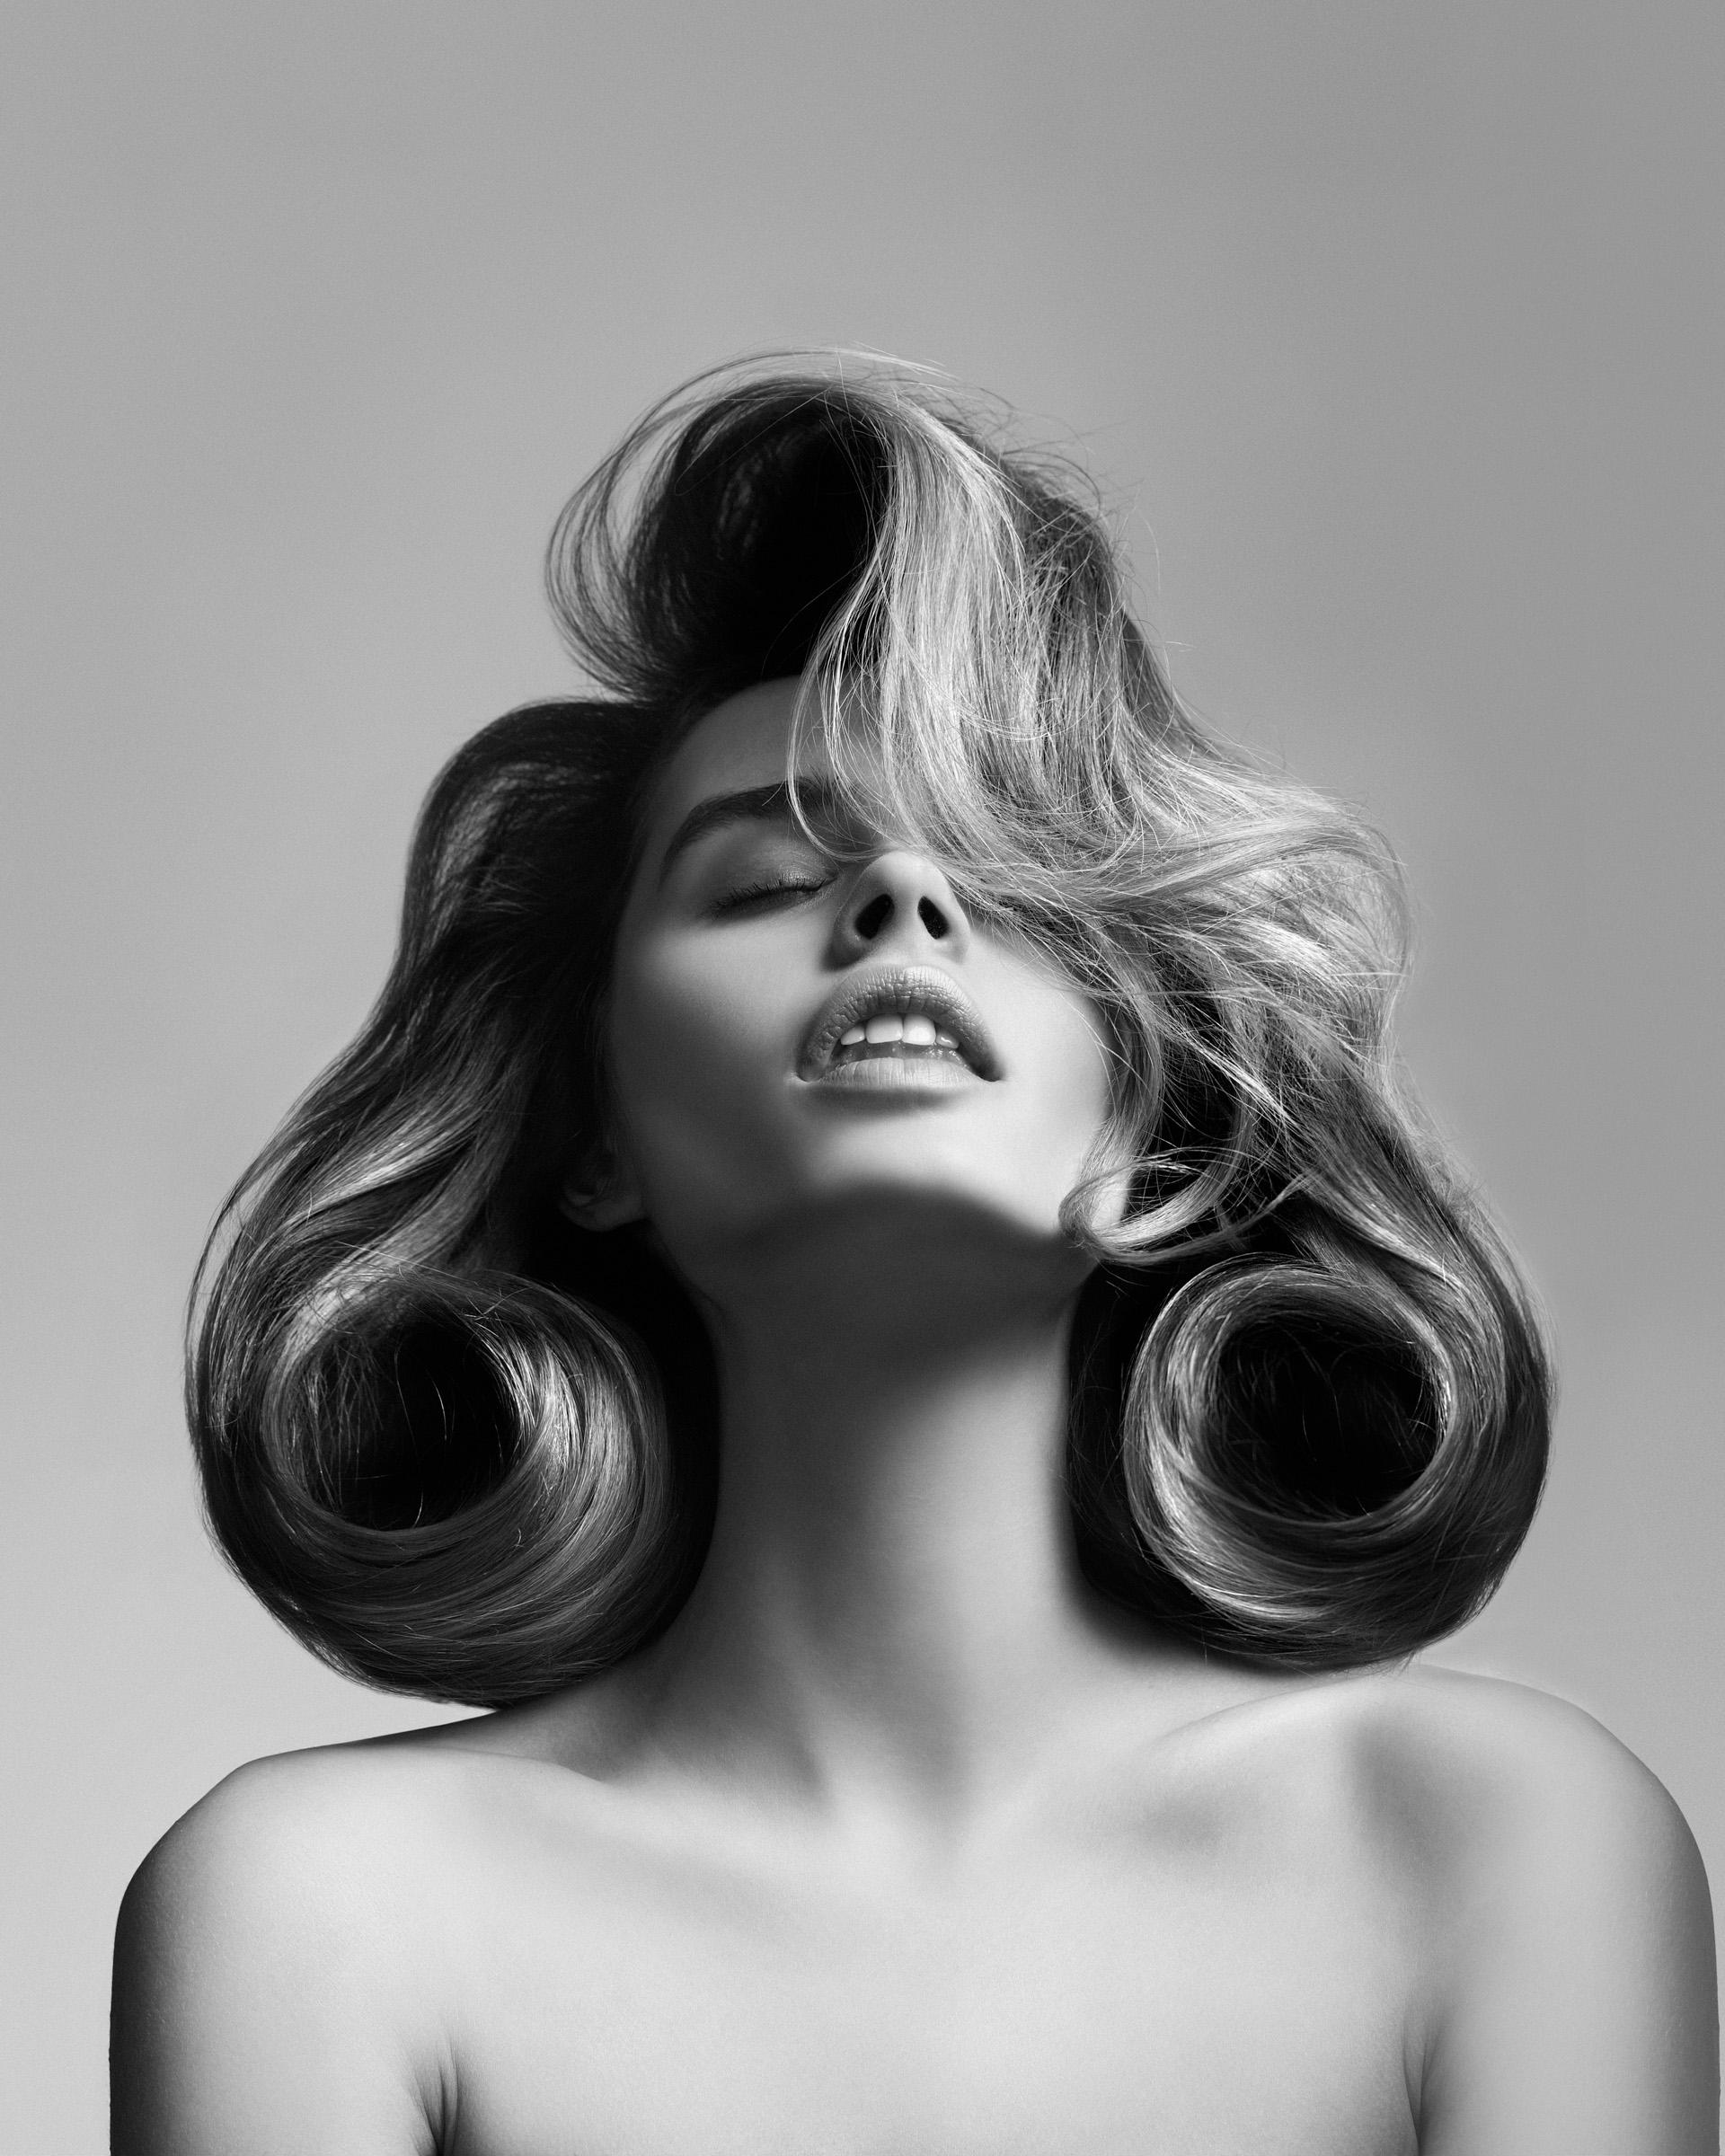 Jack_Eames_Kim_Roy_Hair_Beauty_Photography_London_05.jpg